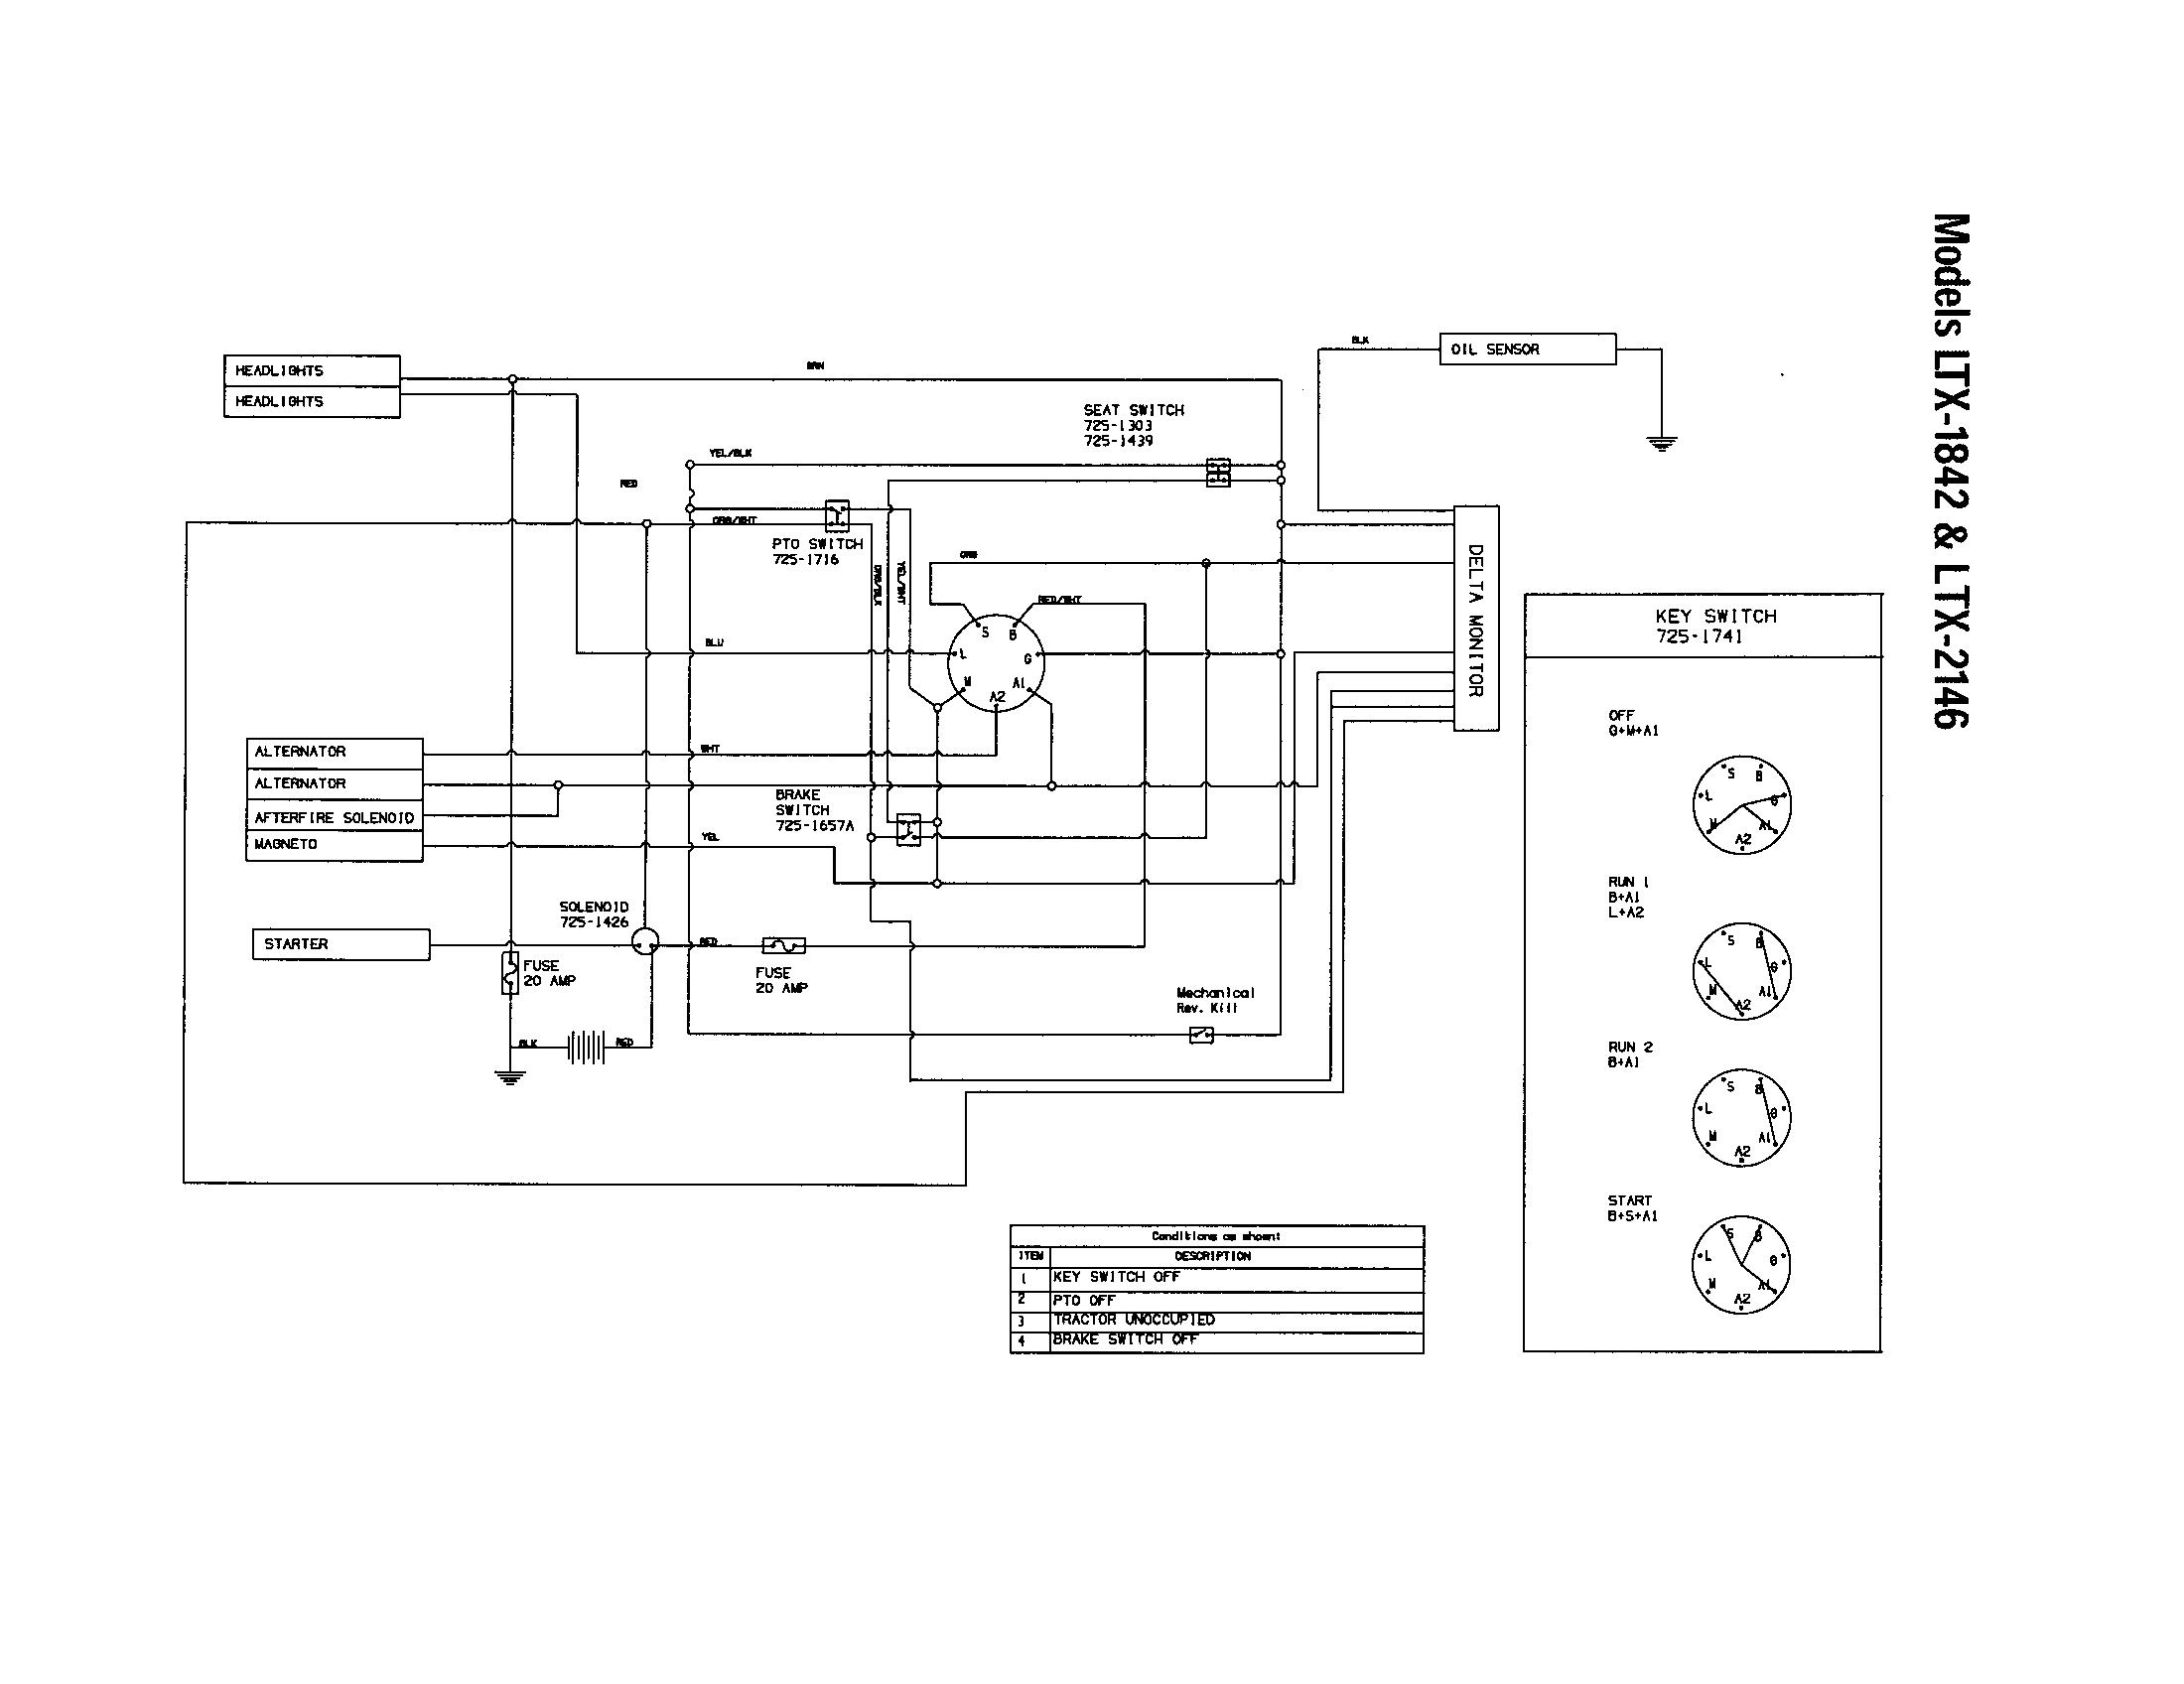 5f6fdf170ac50150de0653e8e97fb173?resize=665%2C513&ssl=1 2003 troy bilt pony wiring diagram international 4300 wiring  at suagrazia.org